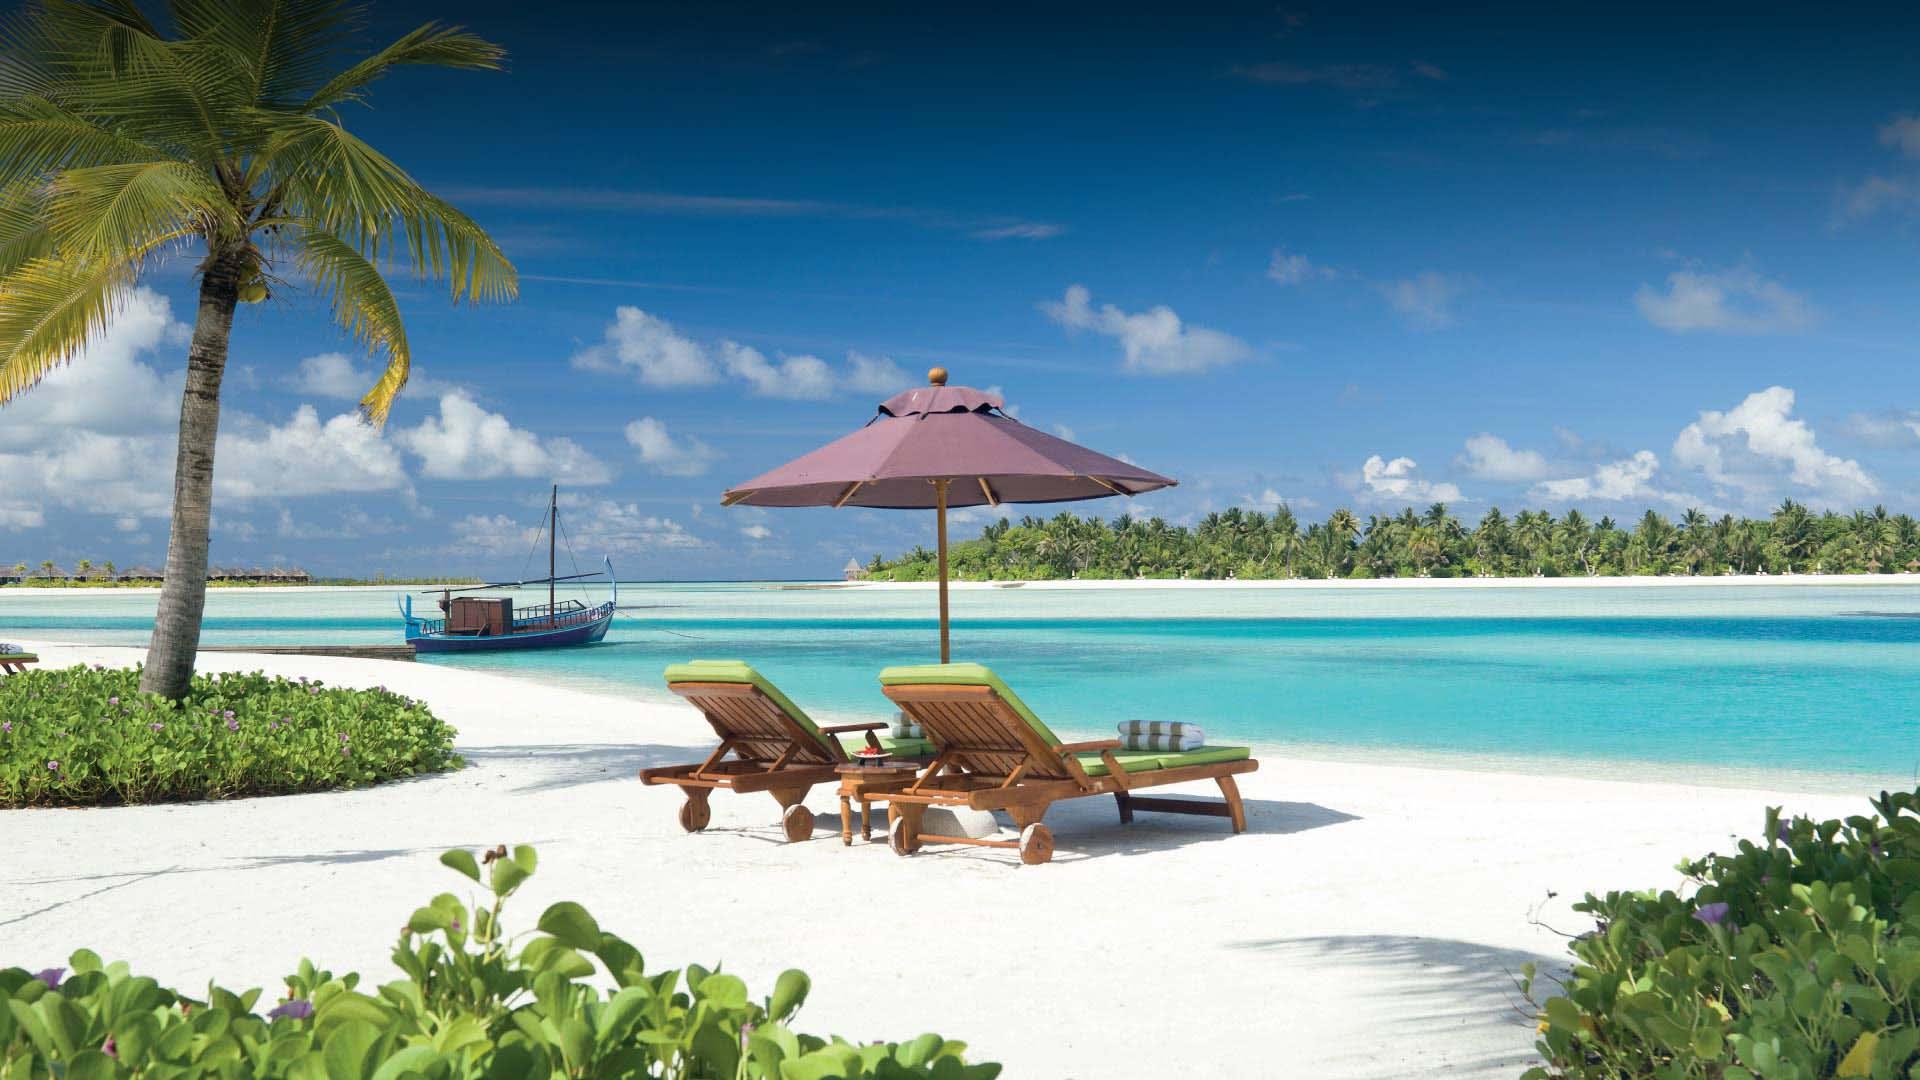 https://assets.anantara.com/image/upload/q_auto,f_auto/media/minor/anantara/images/naladhu-private-island-maldives/the-resort/desktop-banner/naladhu_private_island_beach_and_lagoon_header_1920x1080.jpg